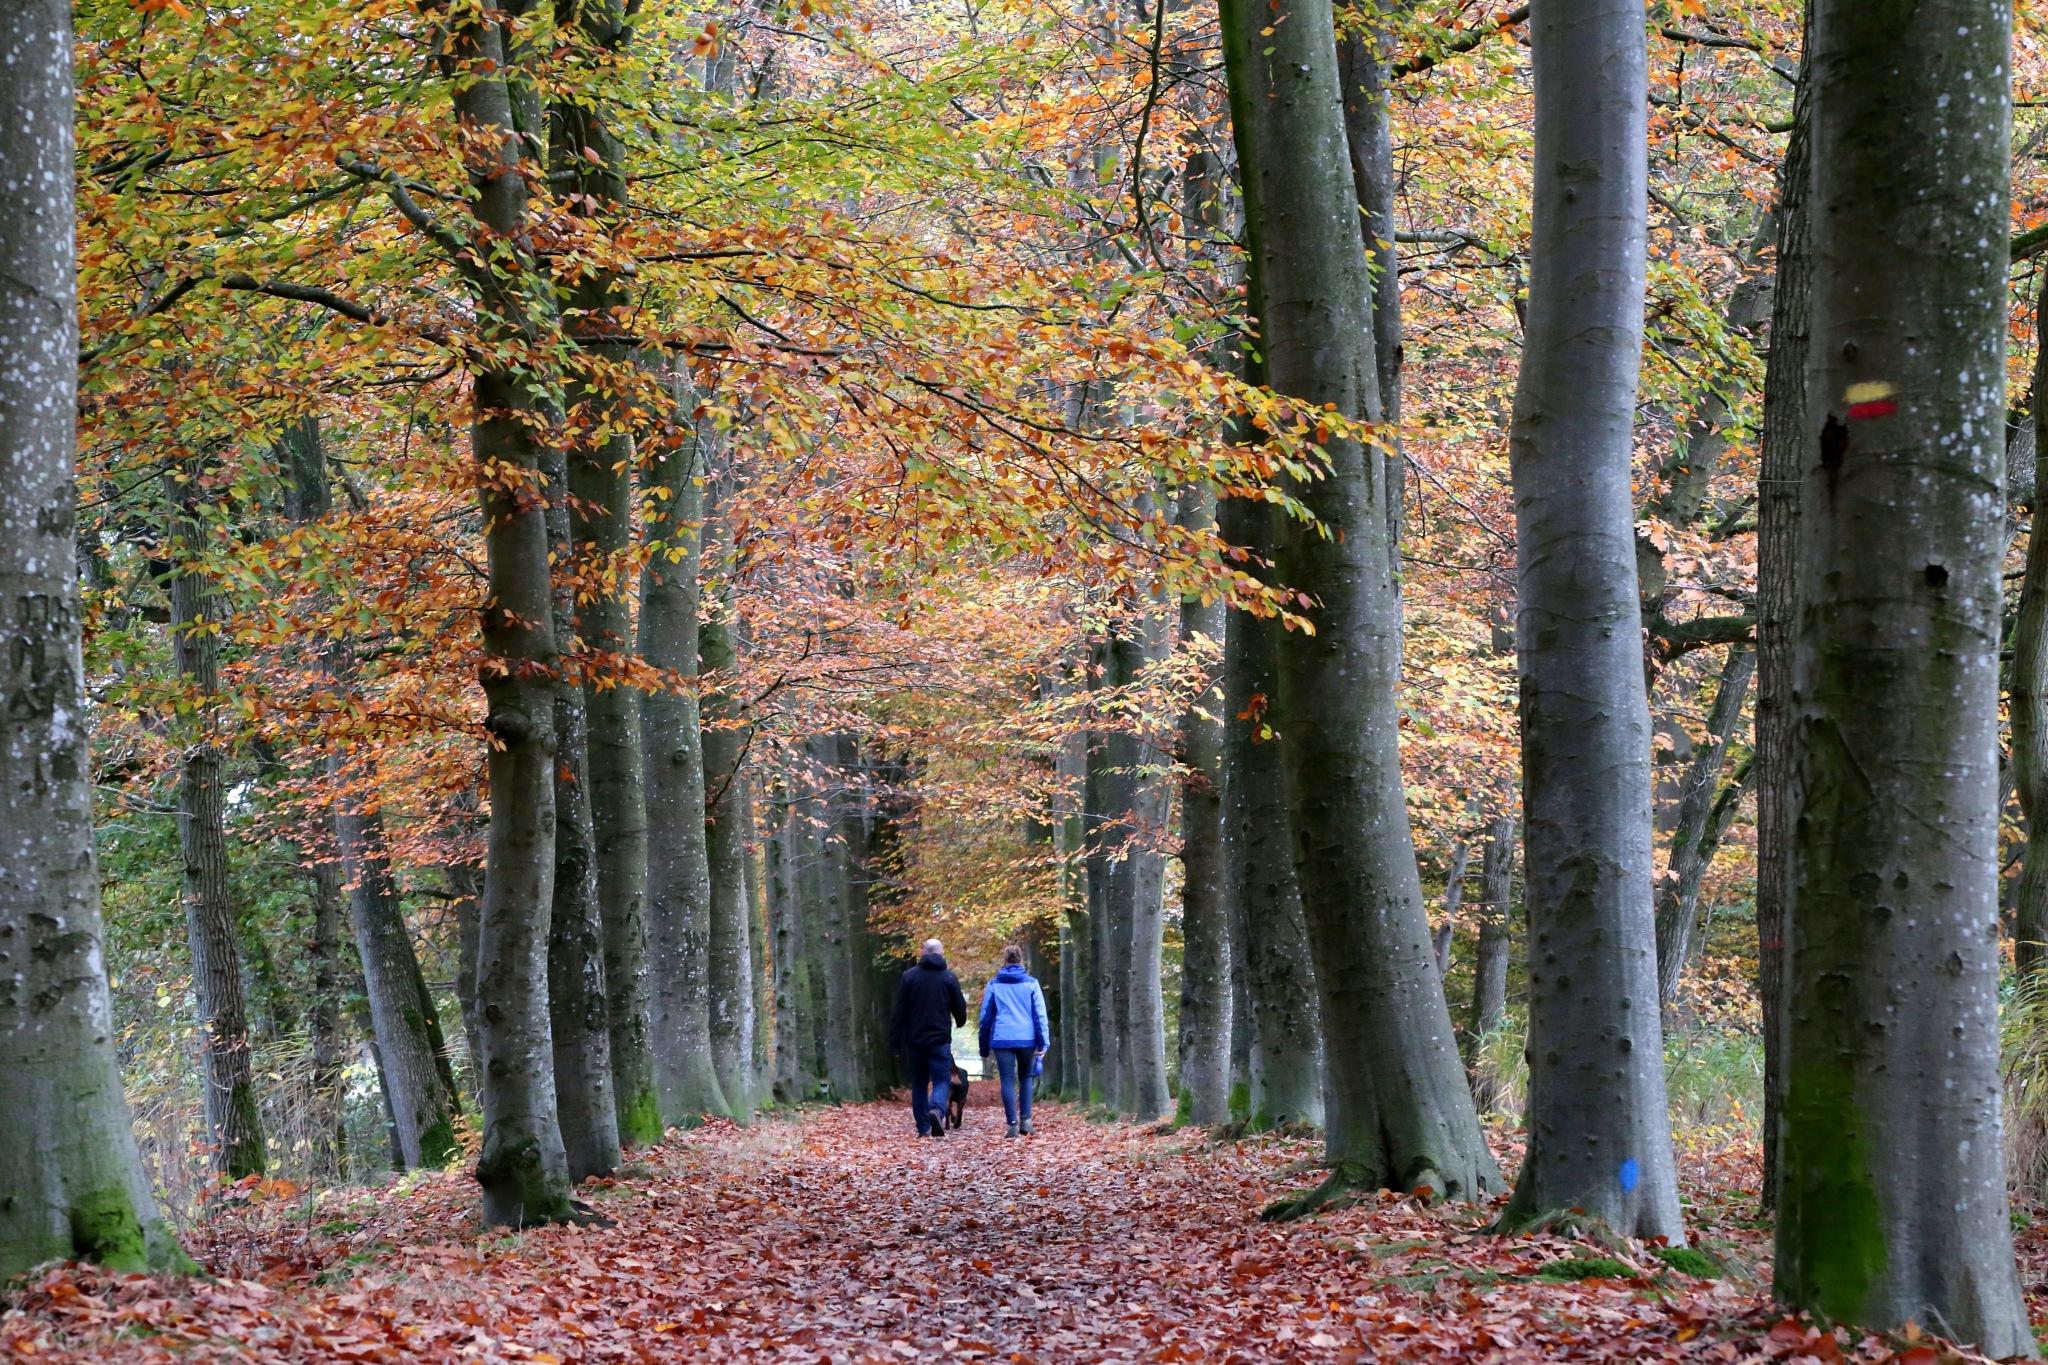 Autumn walk by Sjoerd Weiland